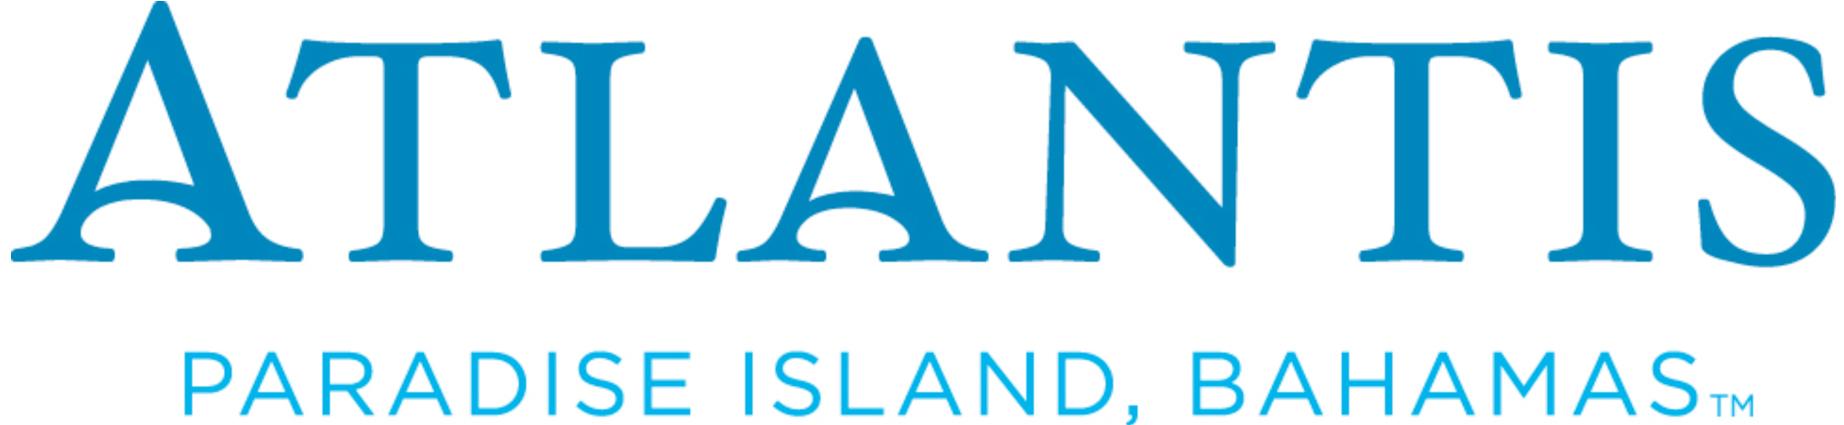 Atlantis Paradise Island, Bahamas